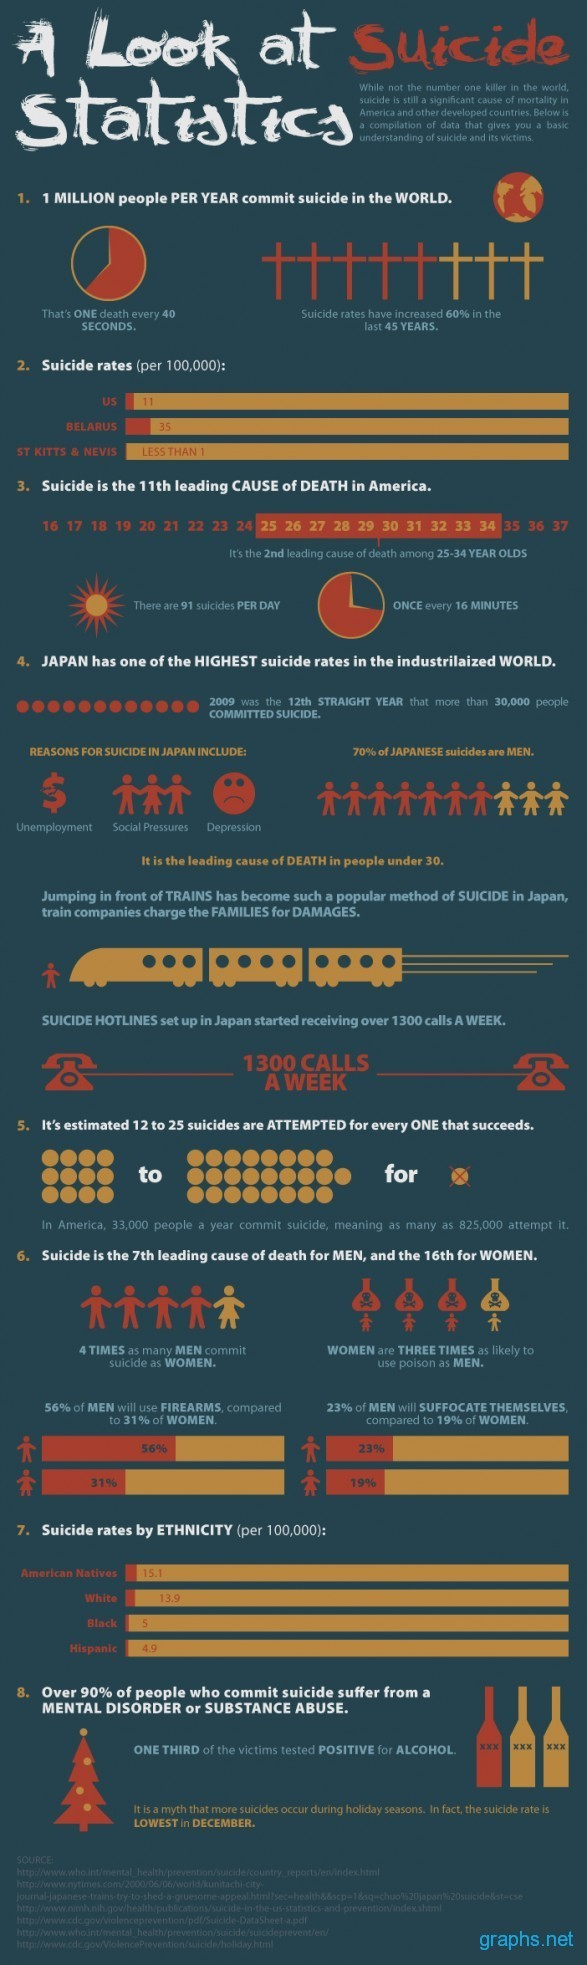 Statistics of Suicide